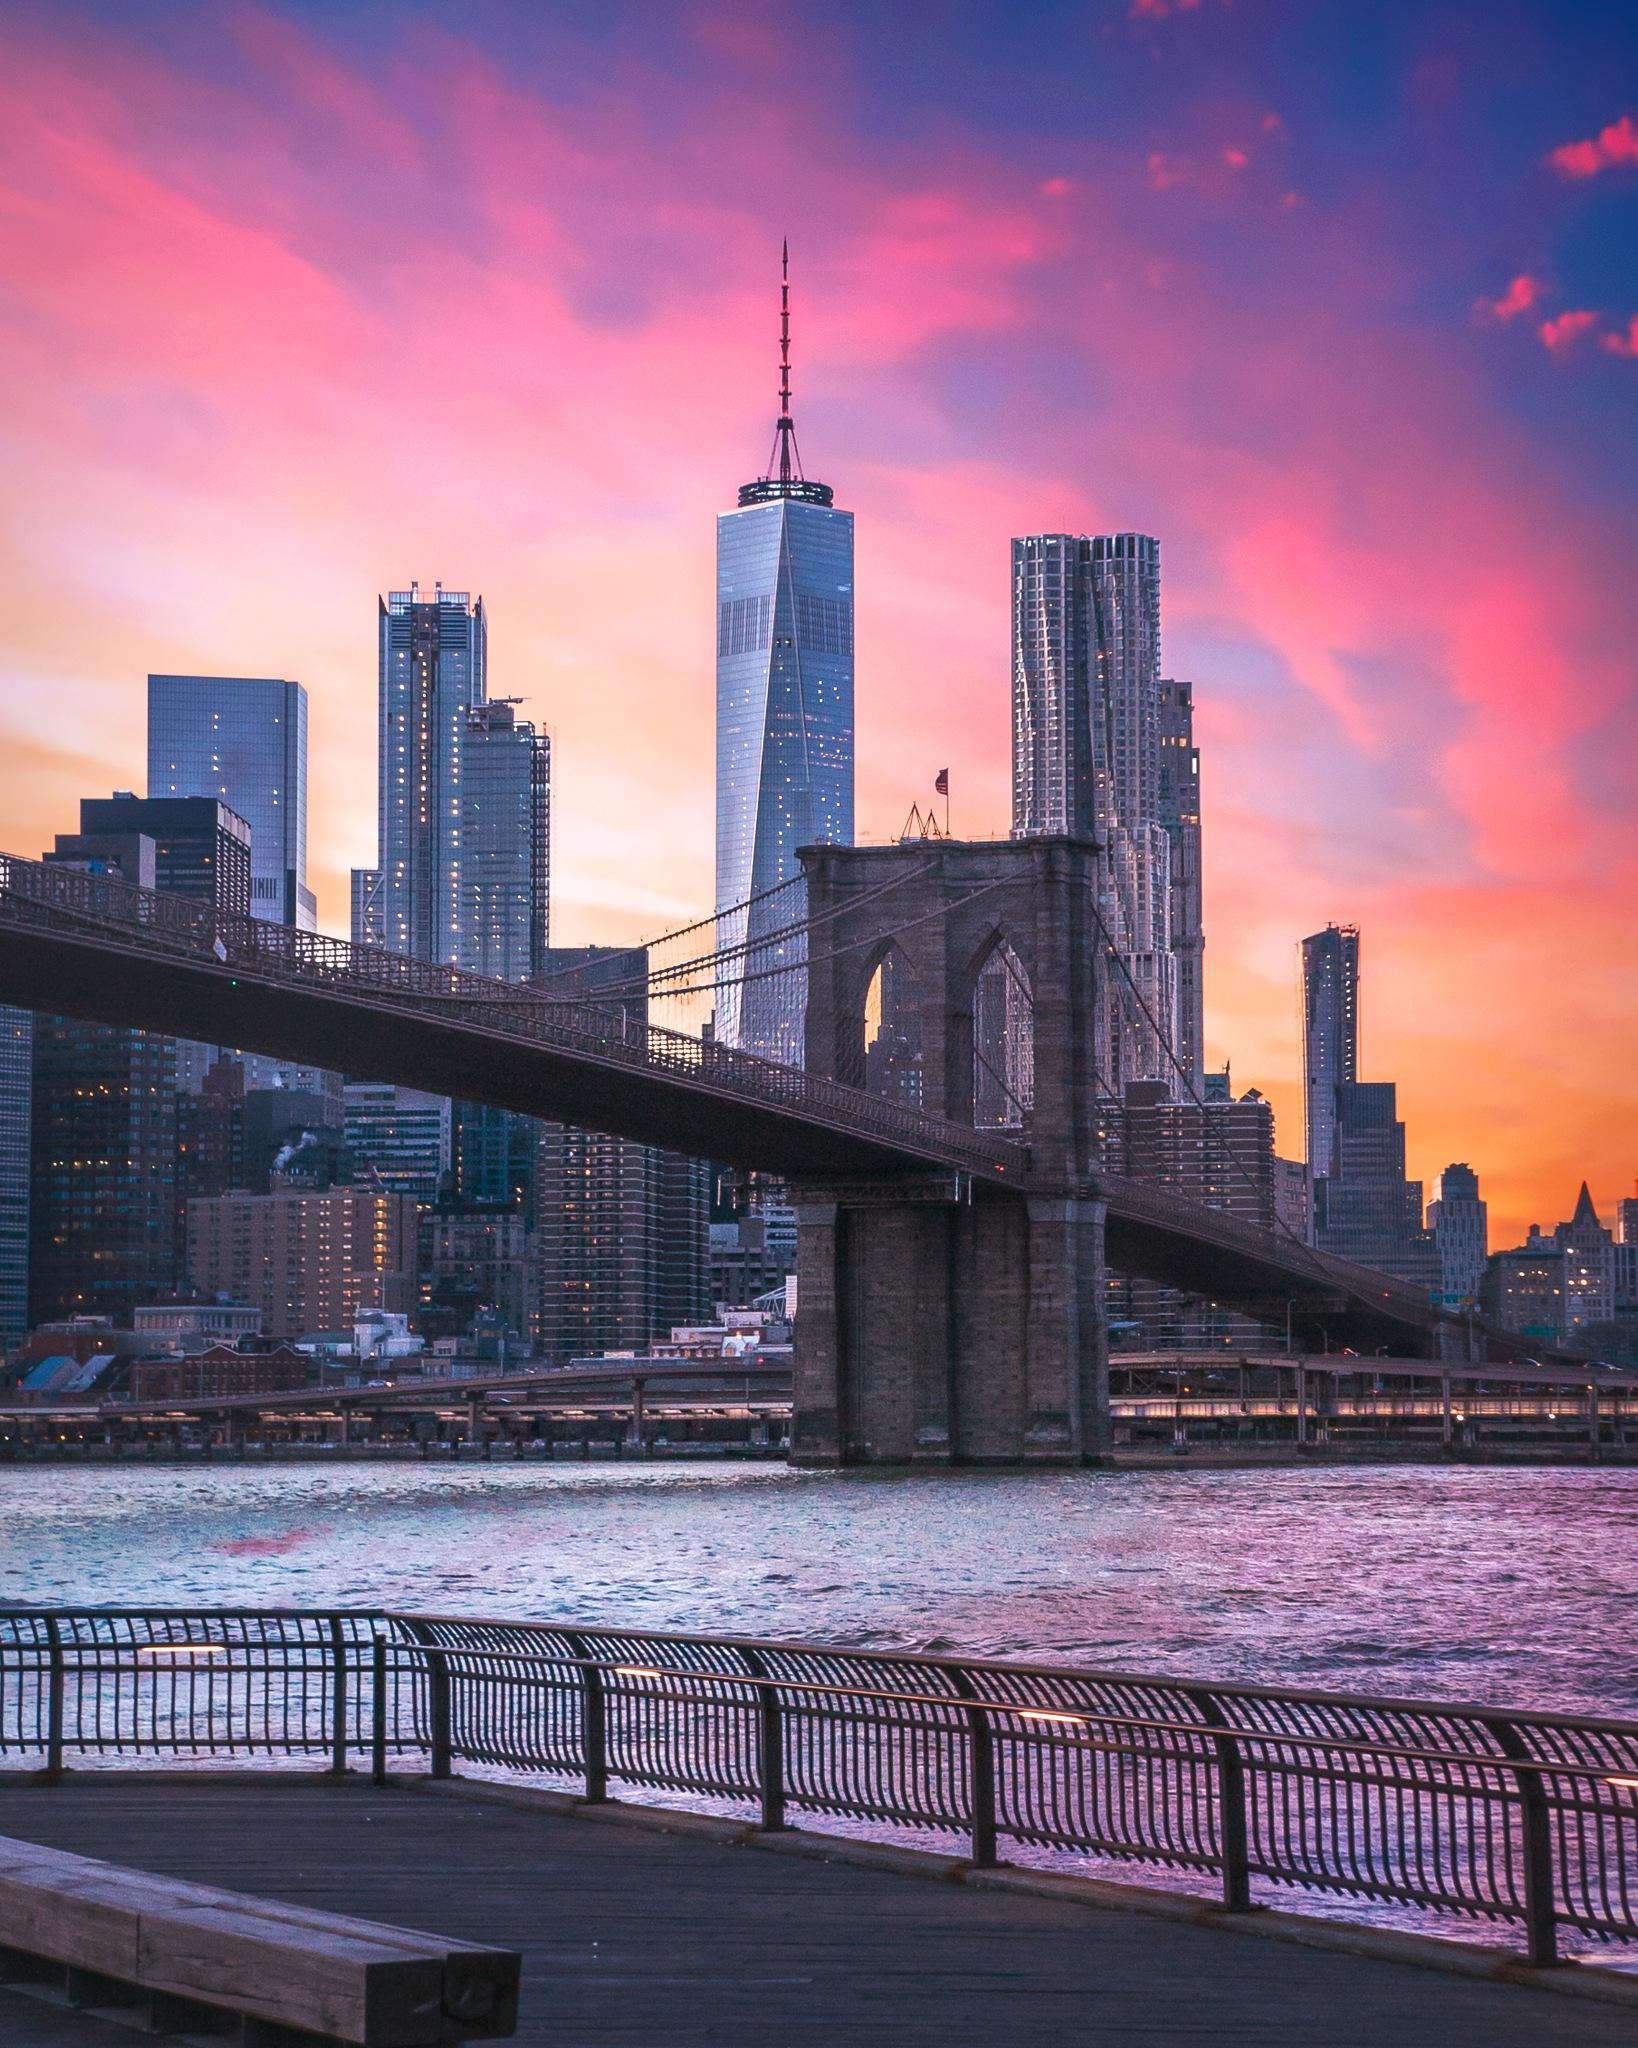 New York by Roman Hopp